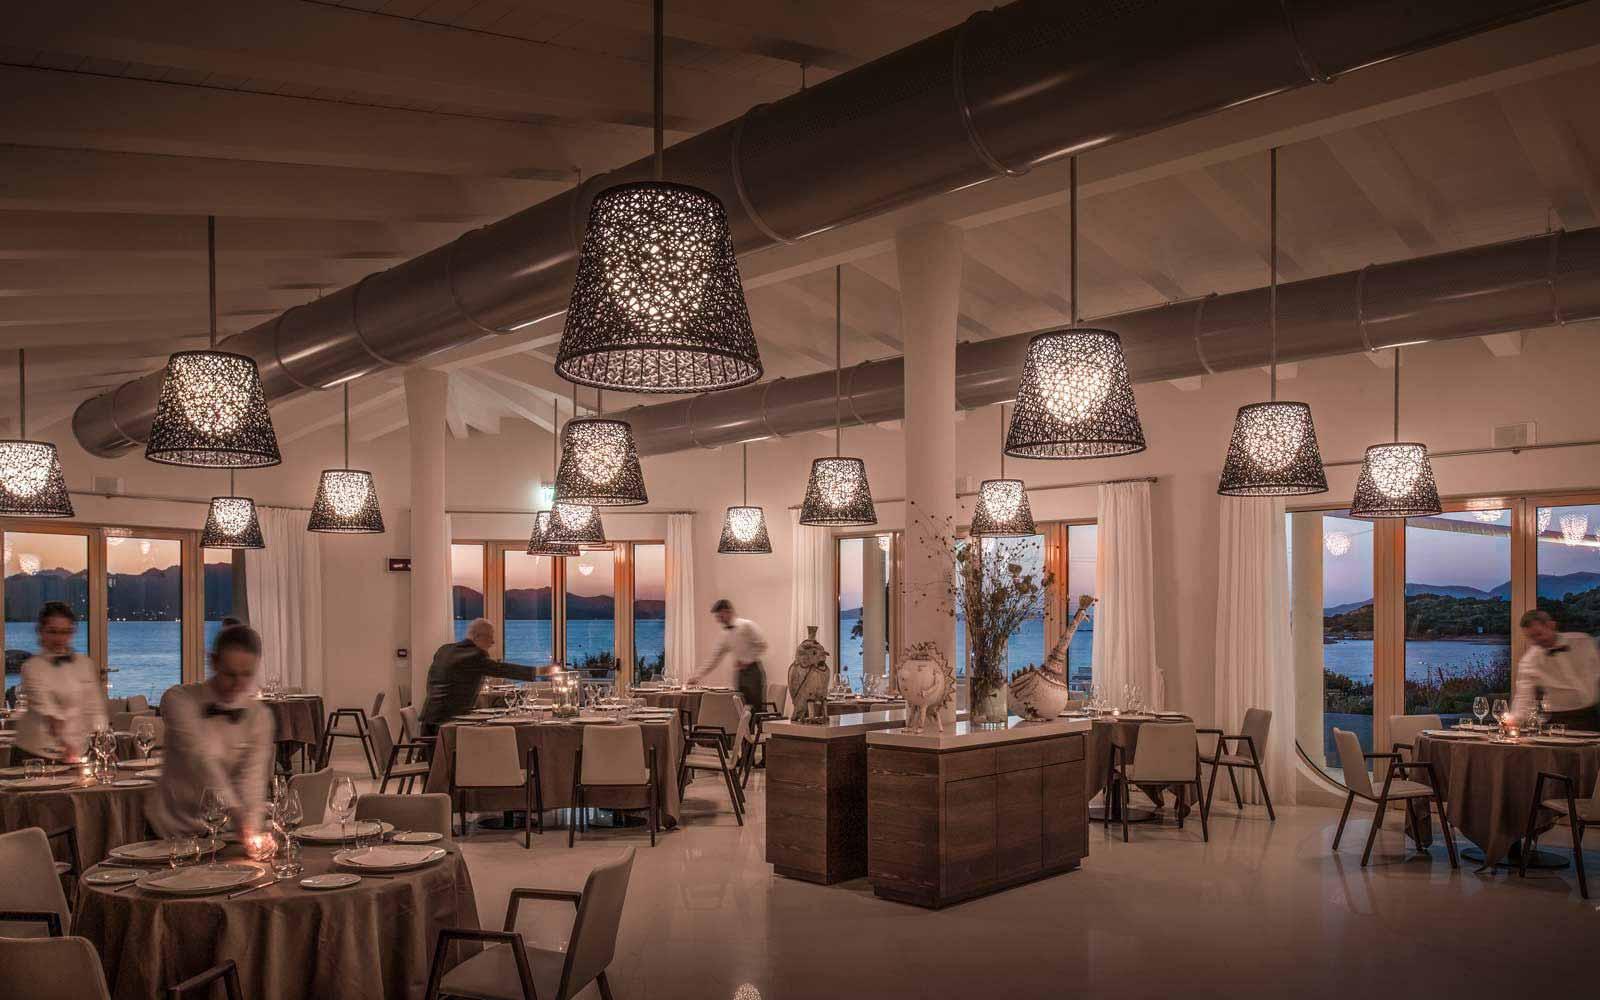 Asarena restaurant at Hotel CalaCuncheddi